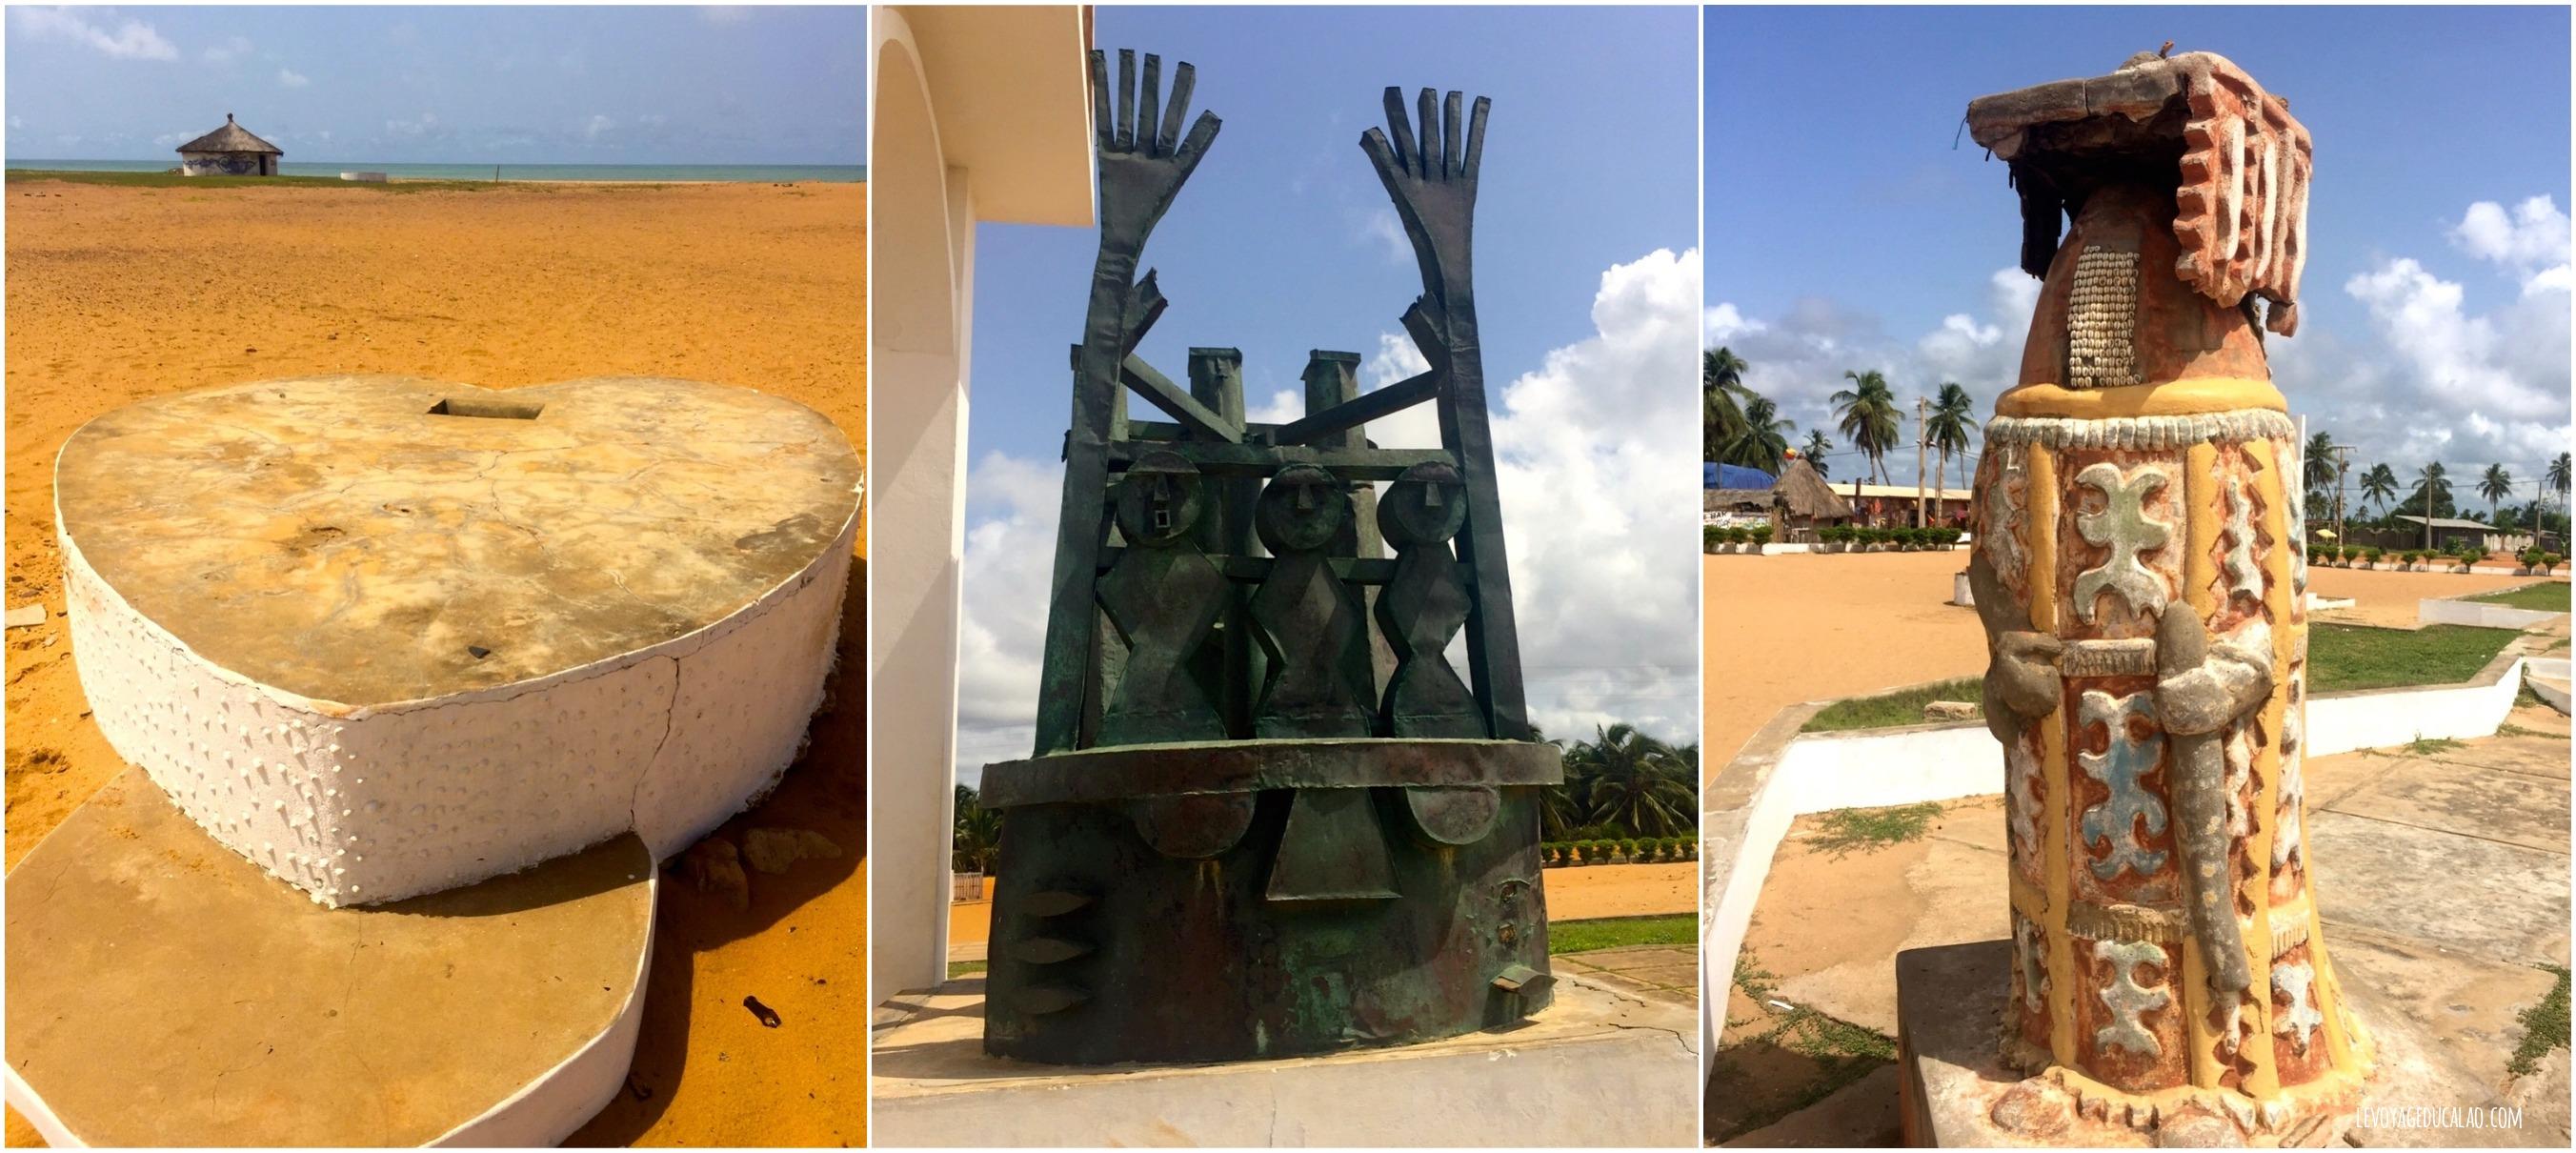 Plage Ouidah Bénin